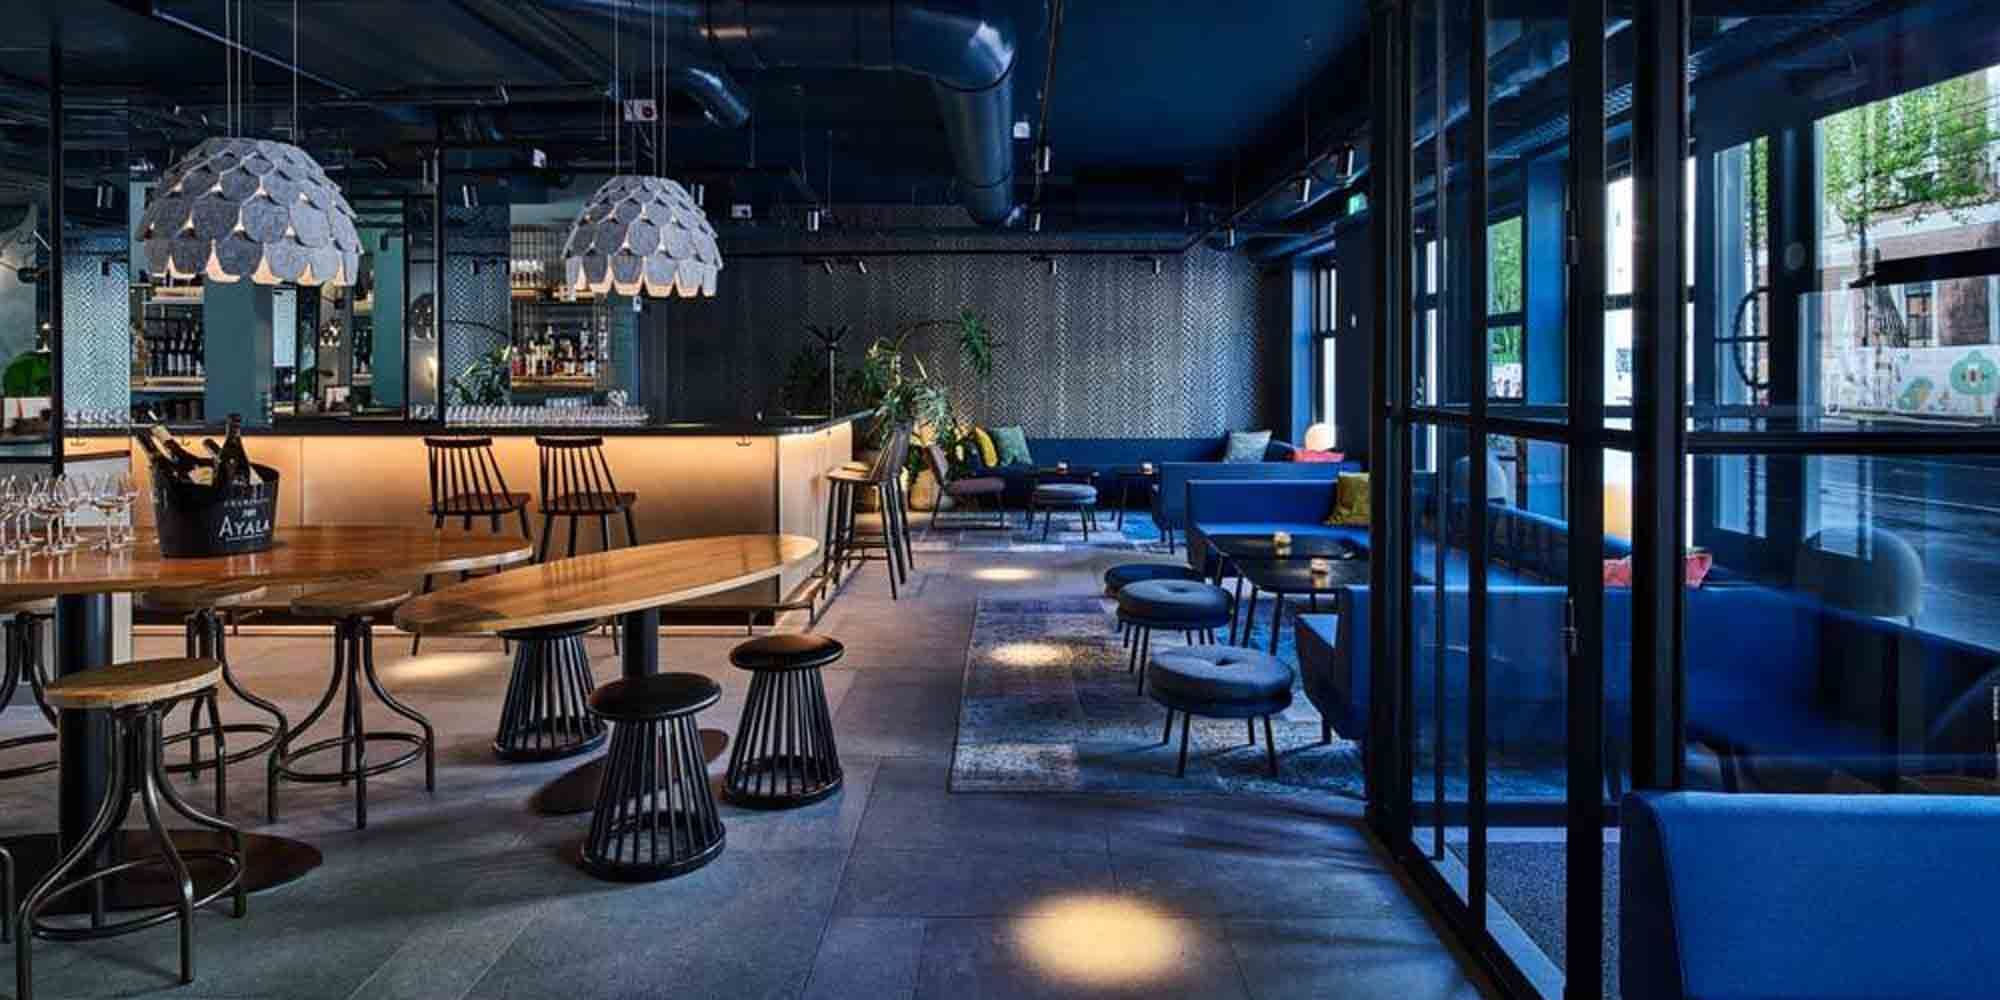 The Birdhouse restaurant Amsterdam